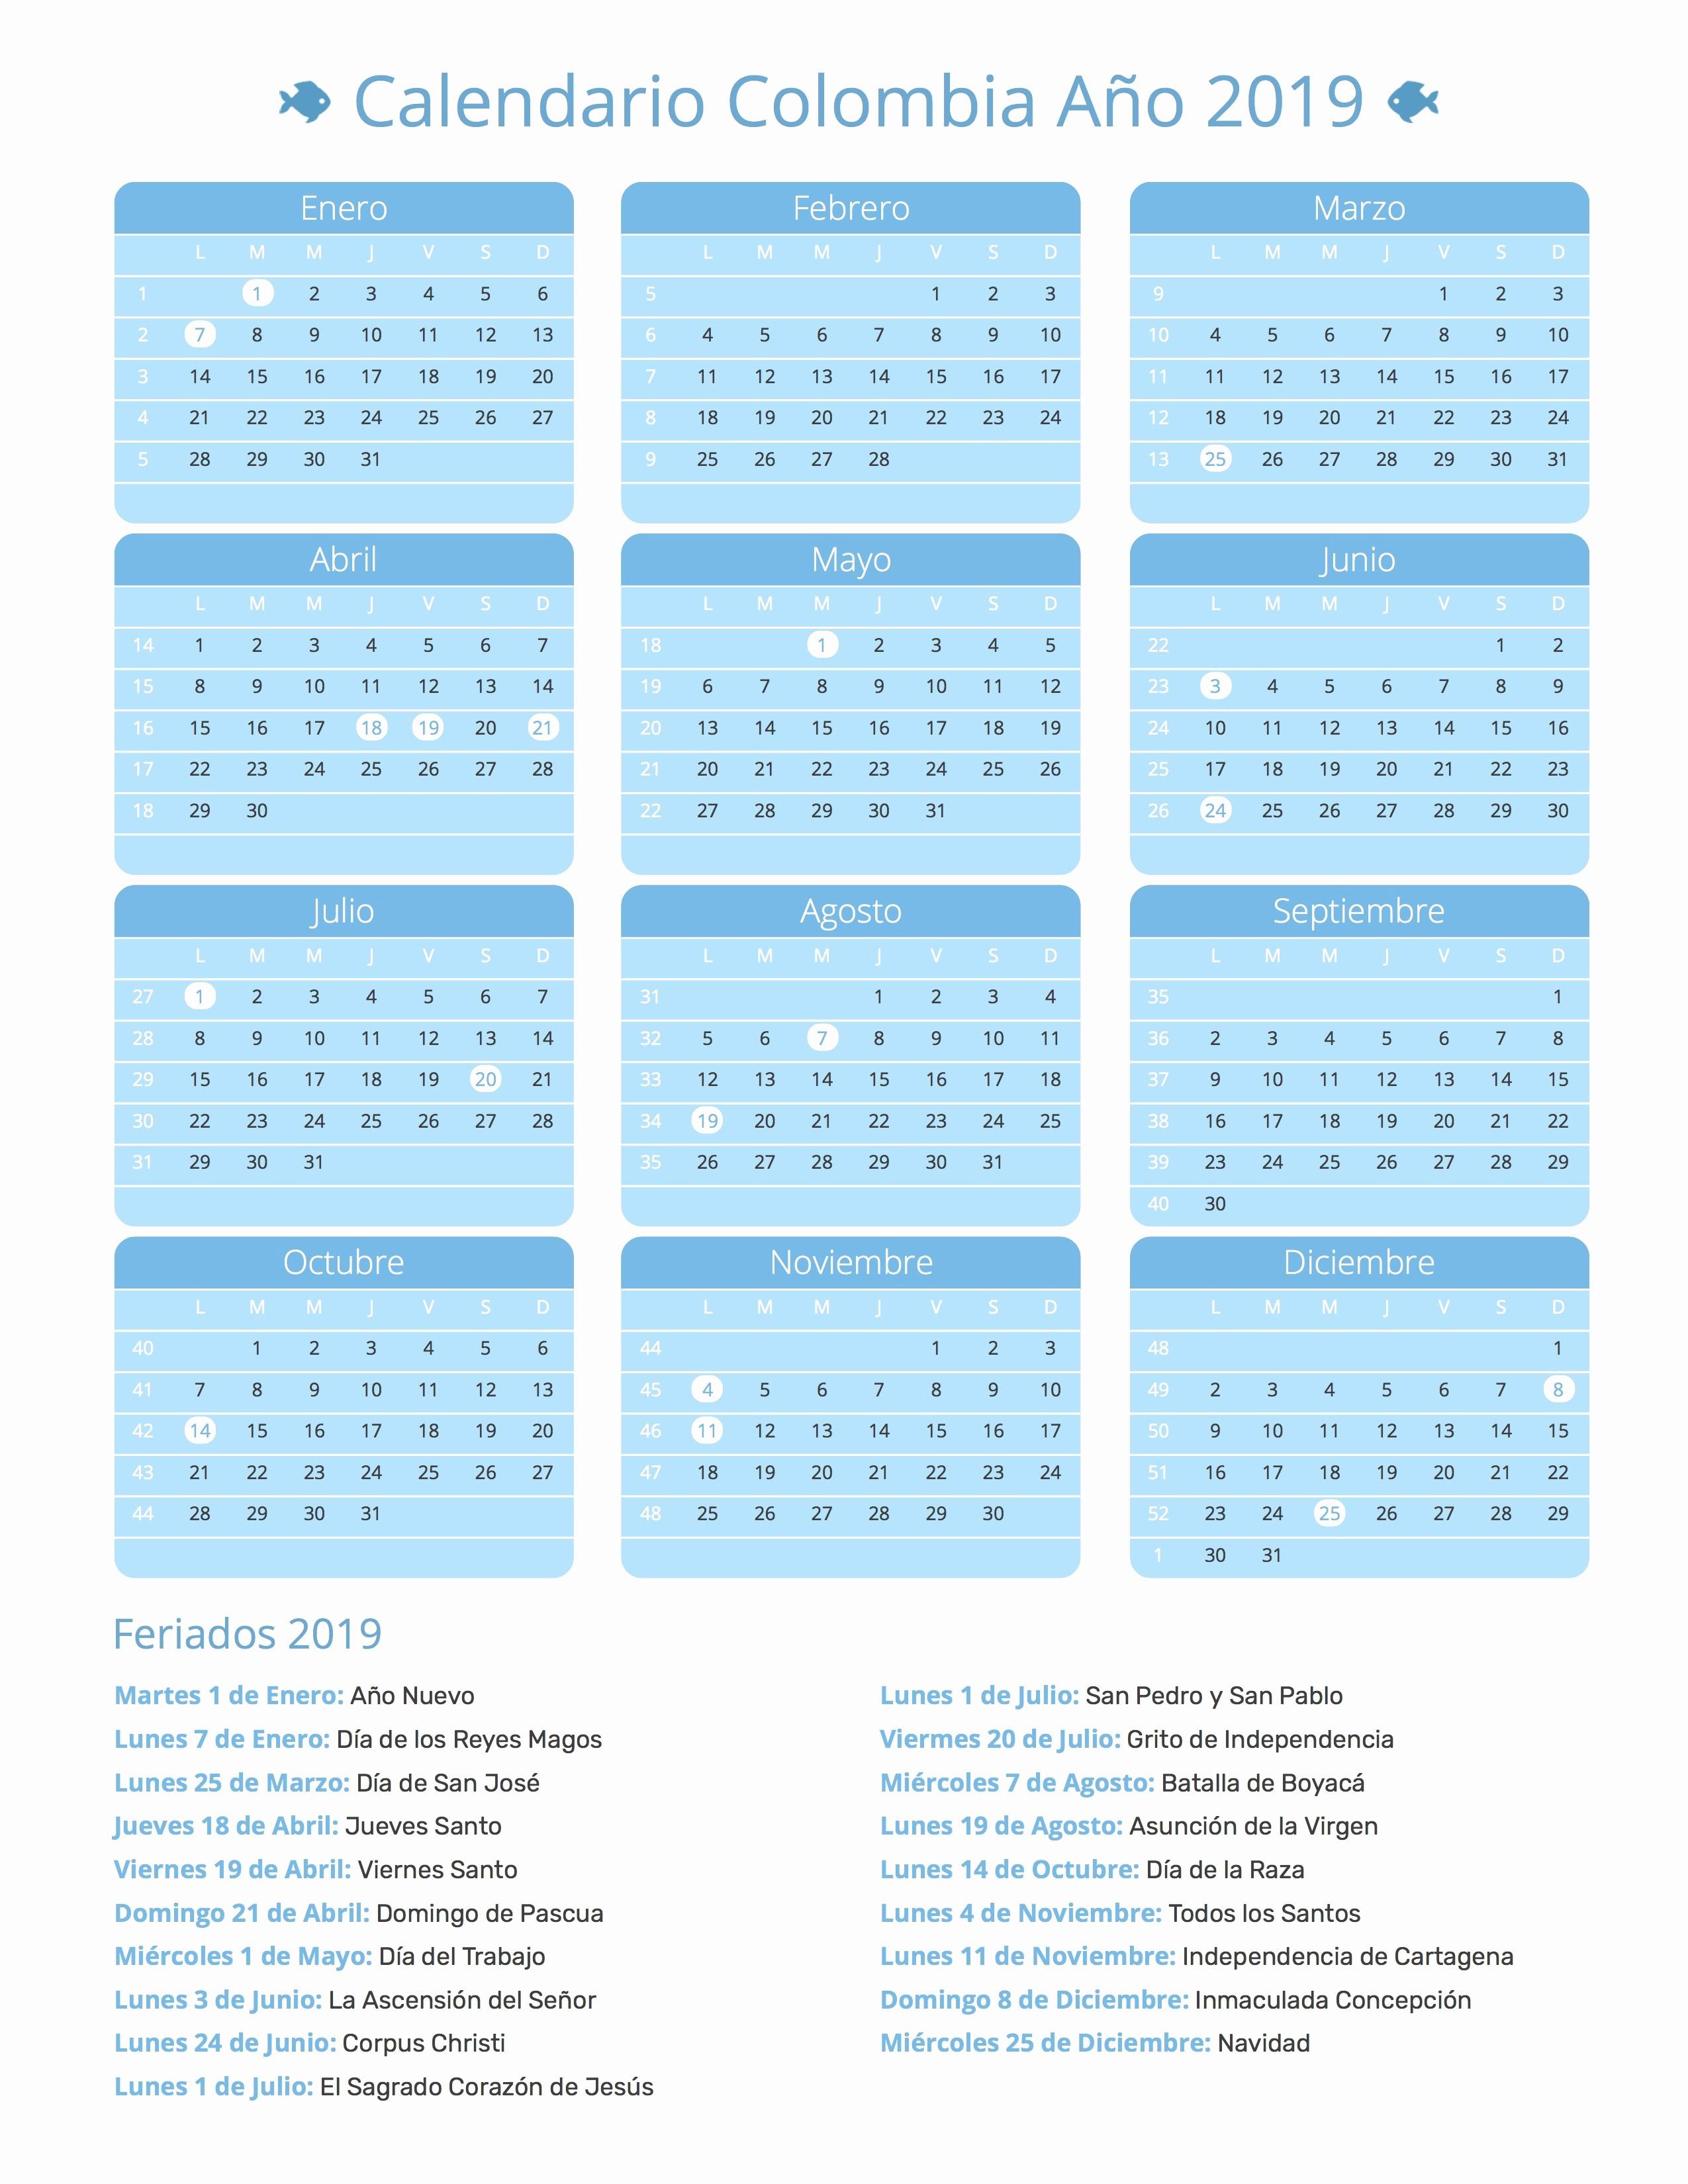 Calendario Lunar 2019 Colombia Calendario Colombia Ano 2019 Feriados